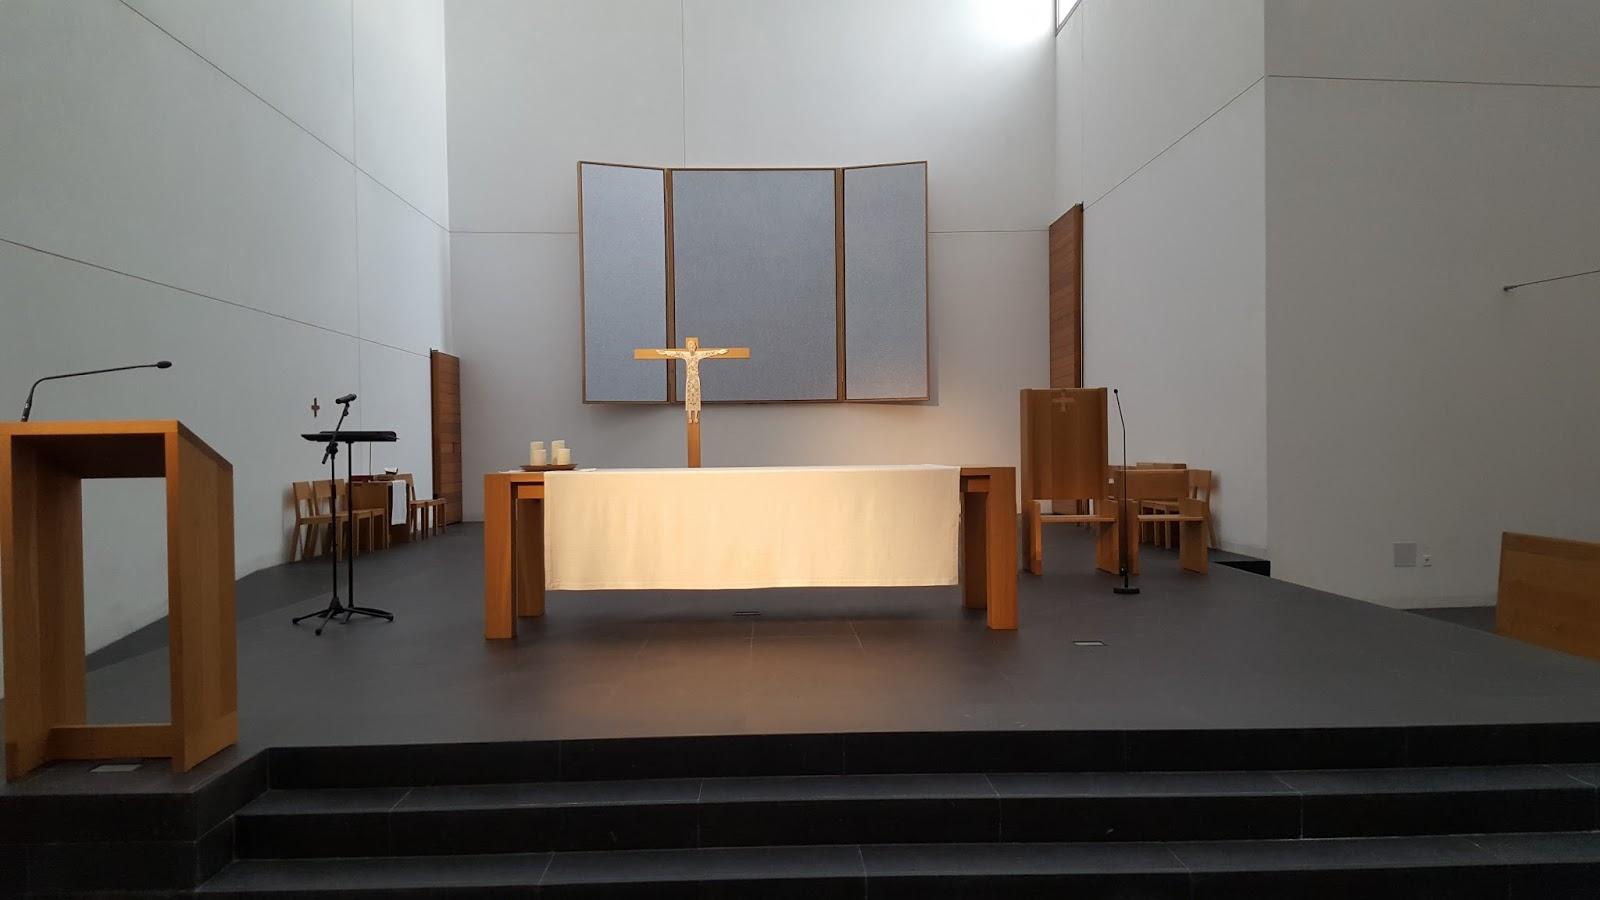 Ugly Churches Win Awards | Catholic News Live